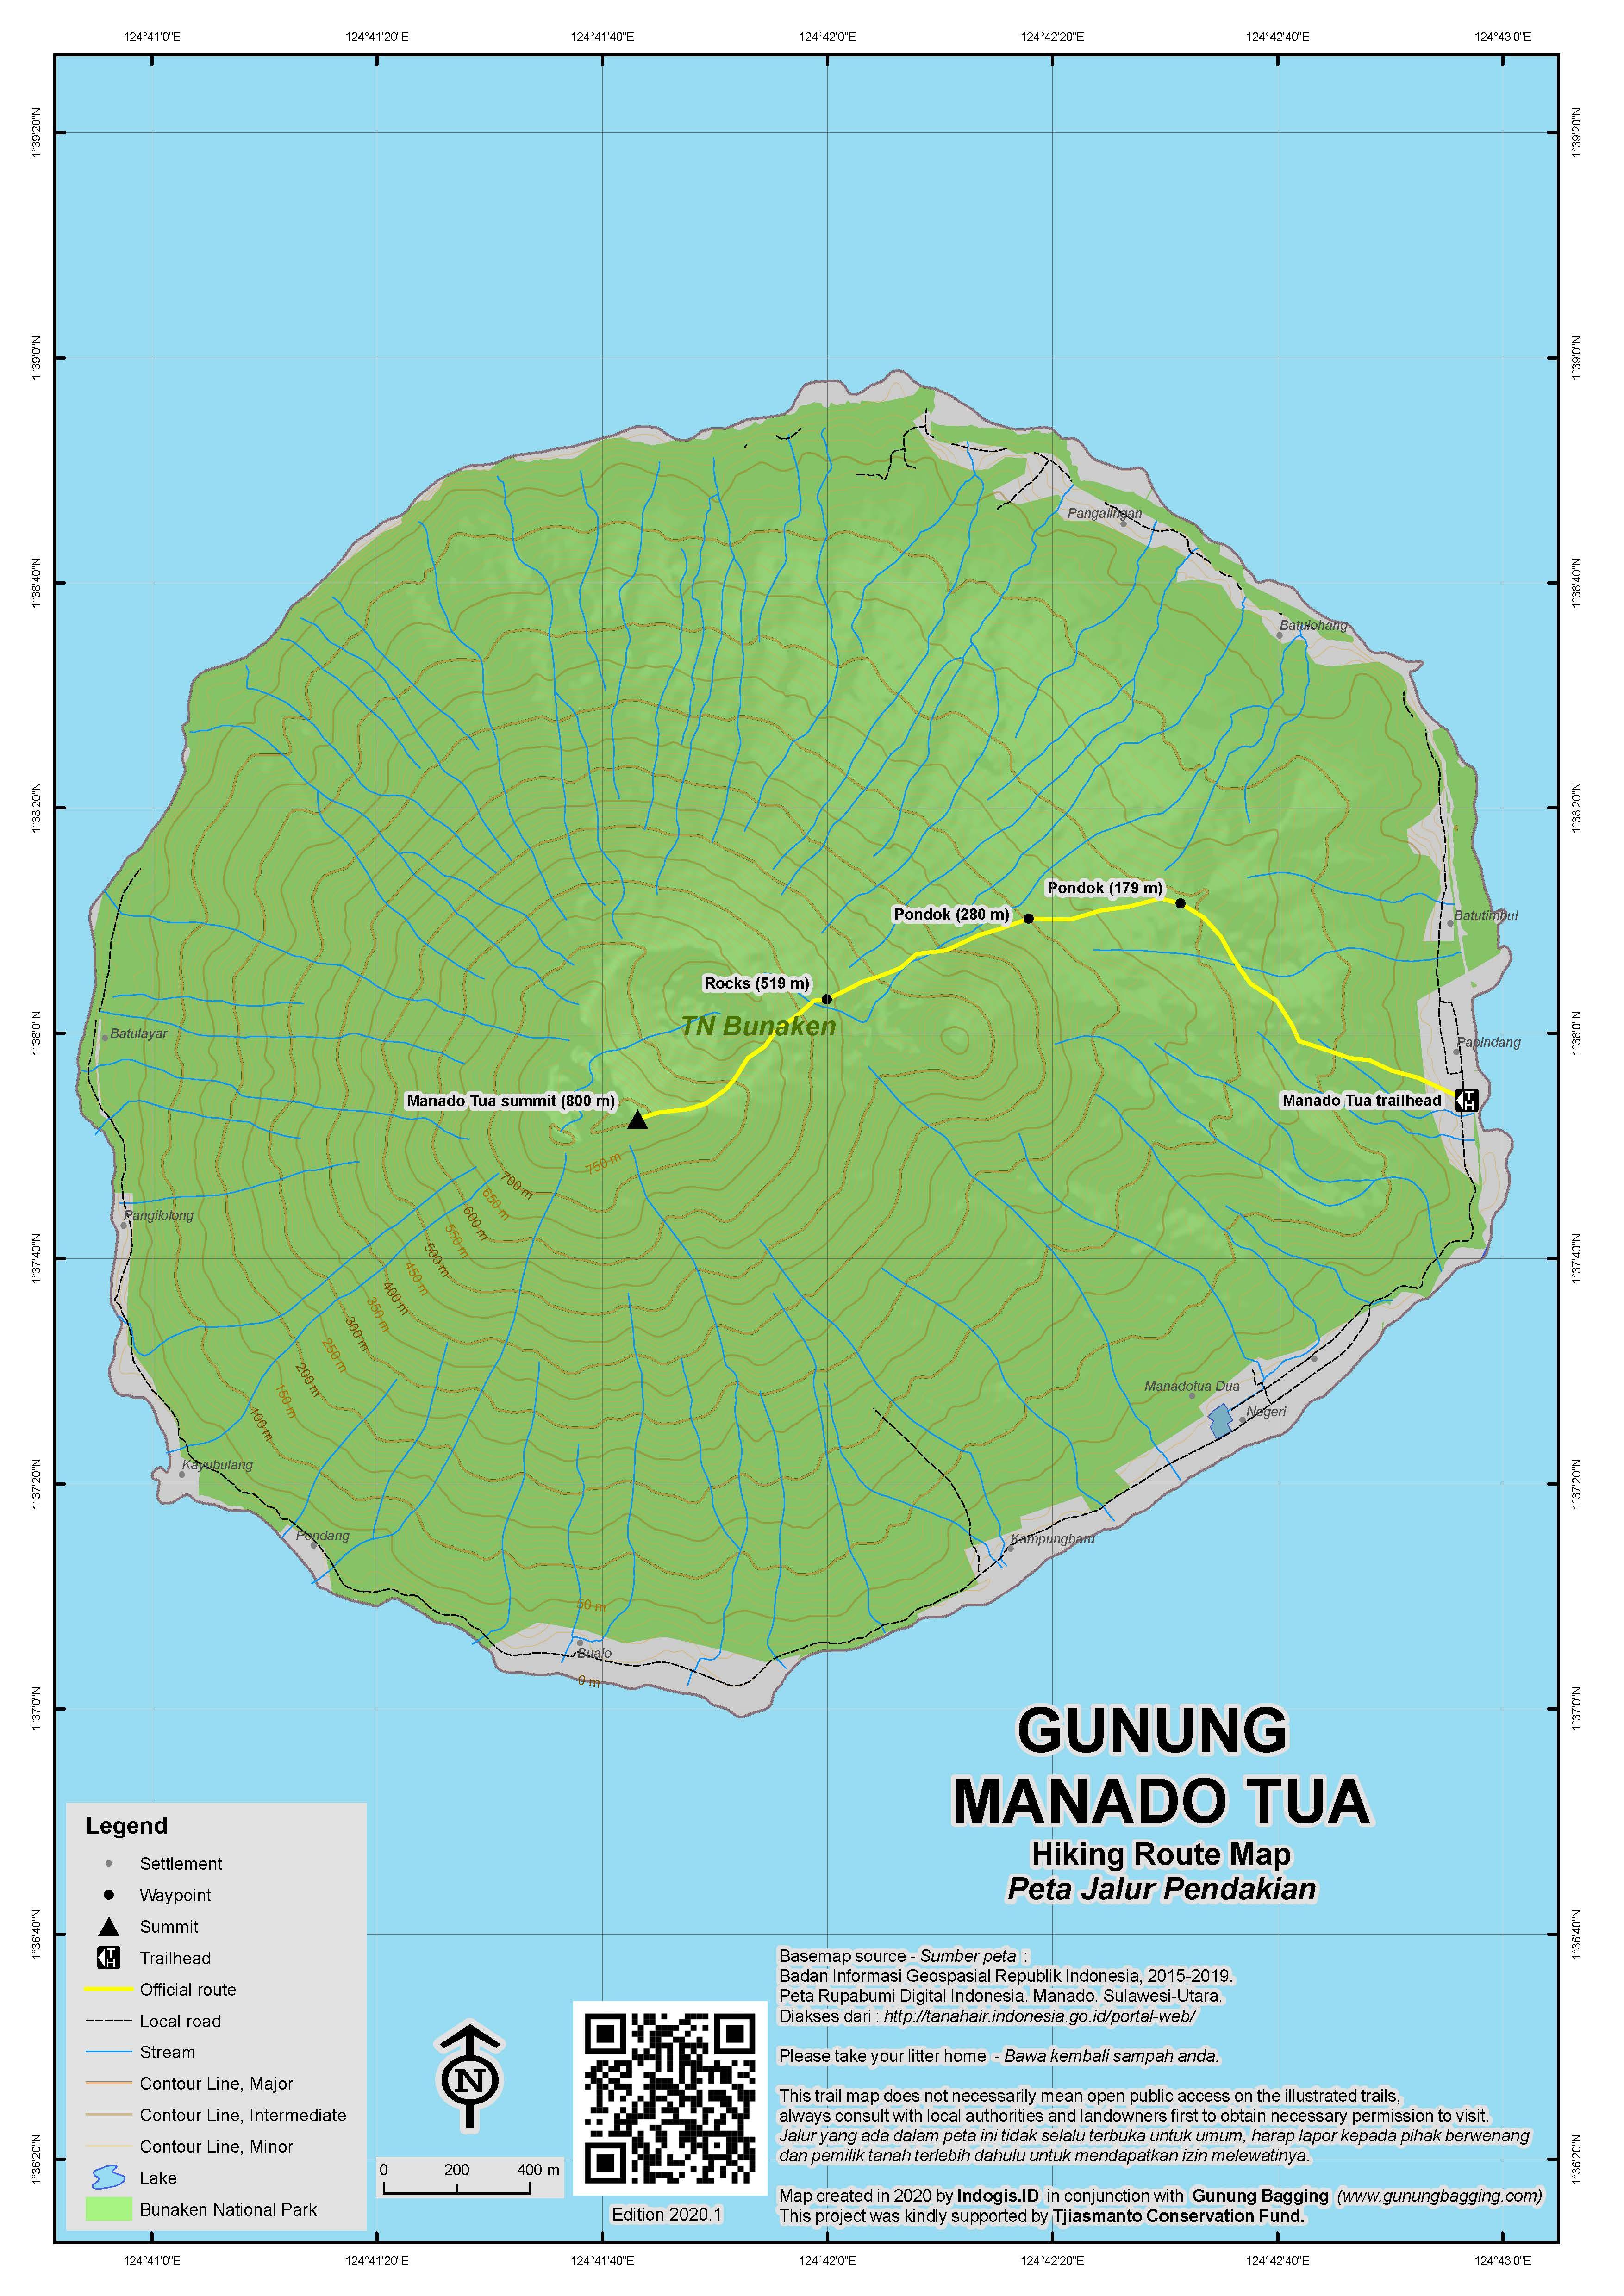 Peta Jalur Pendakian Gunung Manado Tua